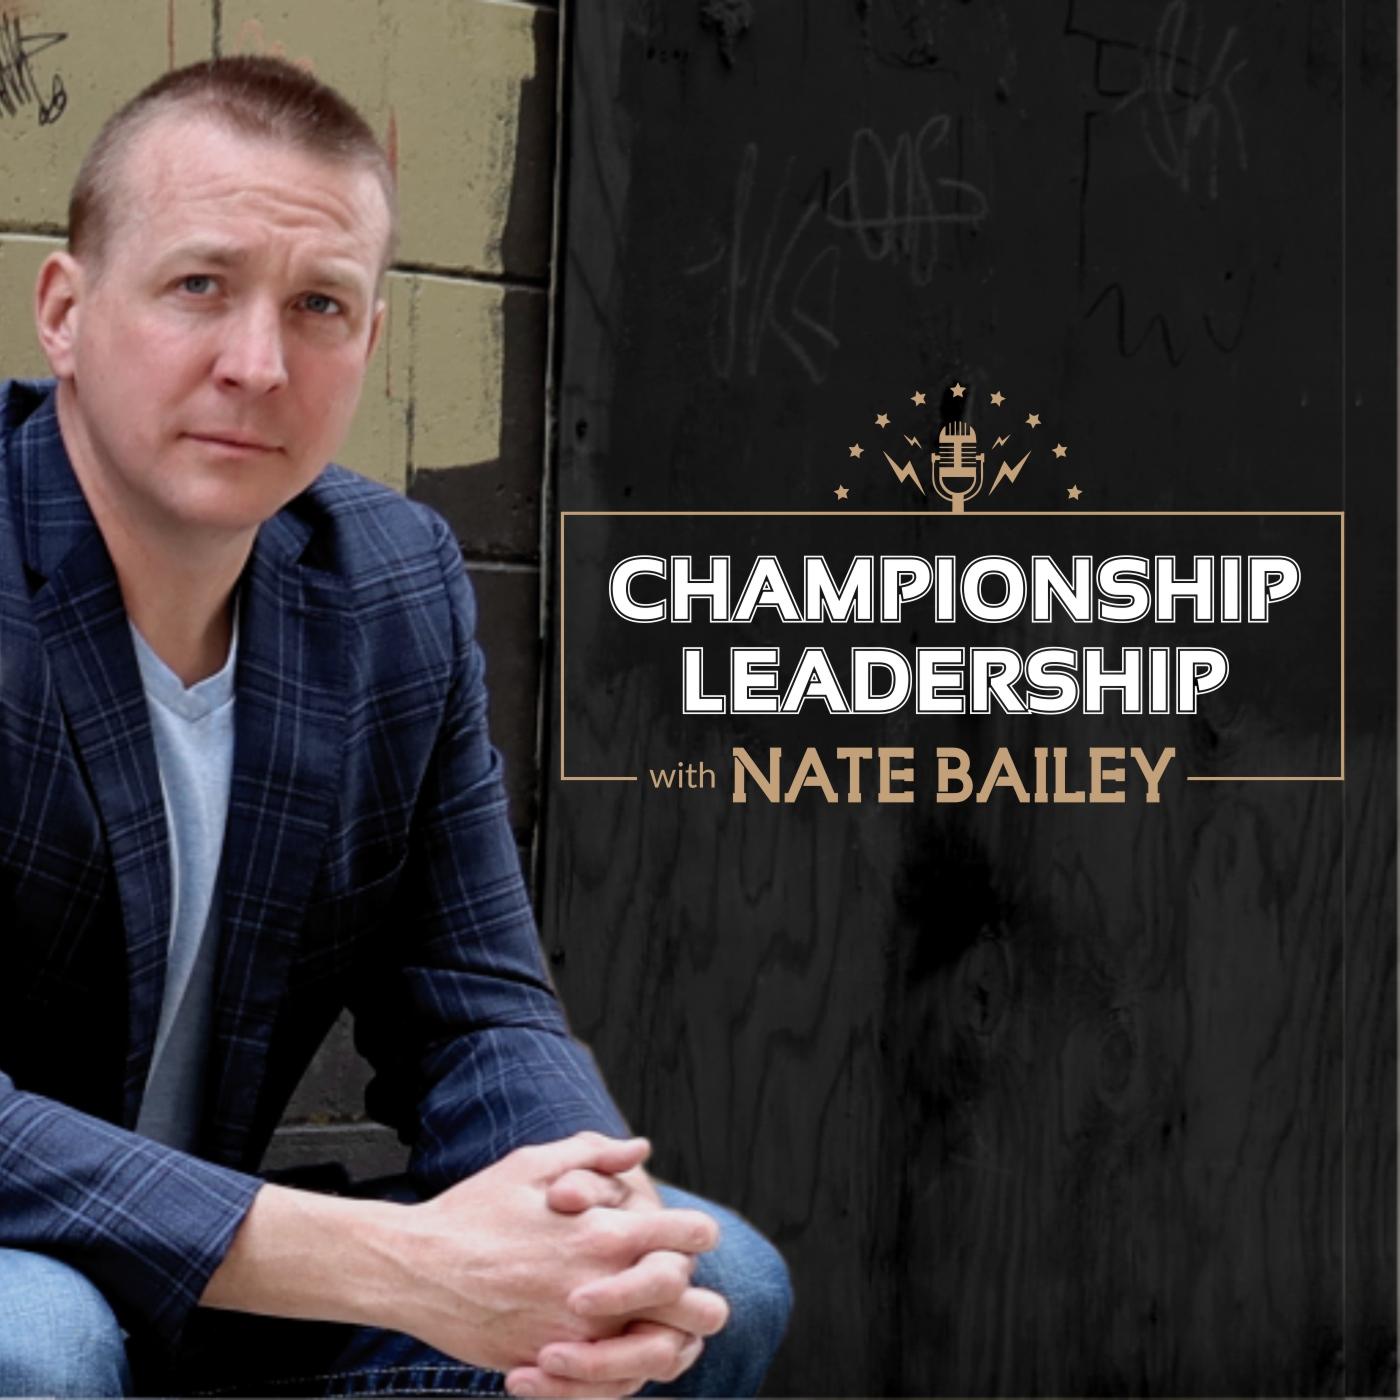 Championship Leadership